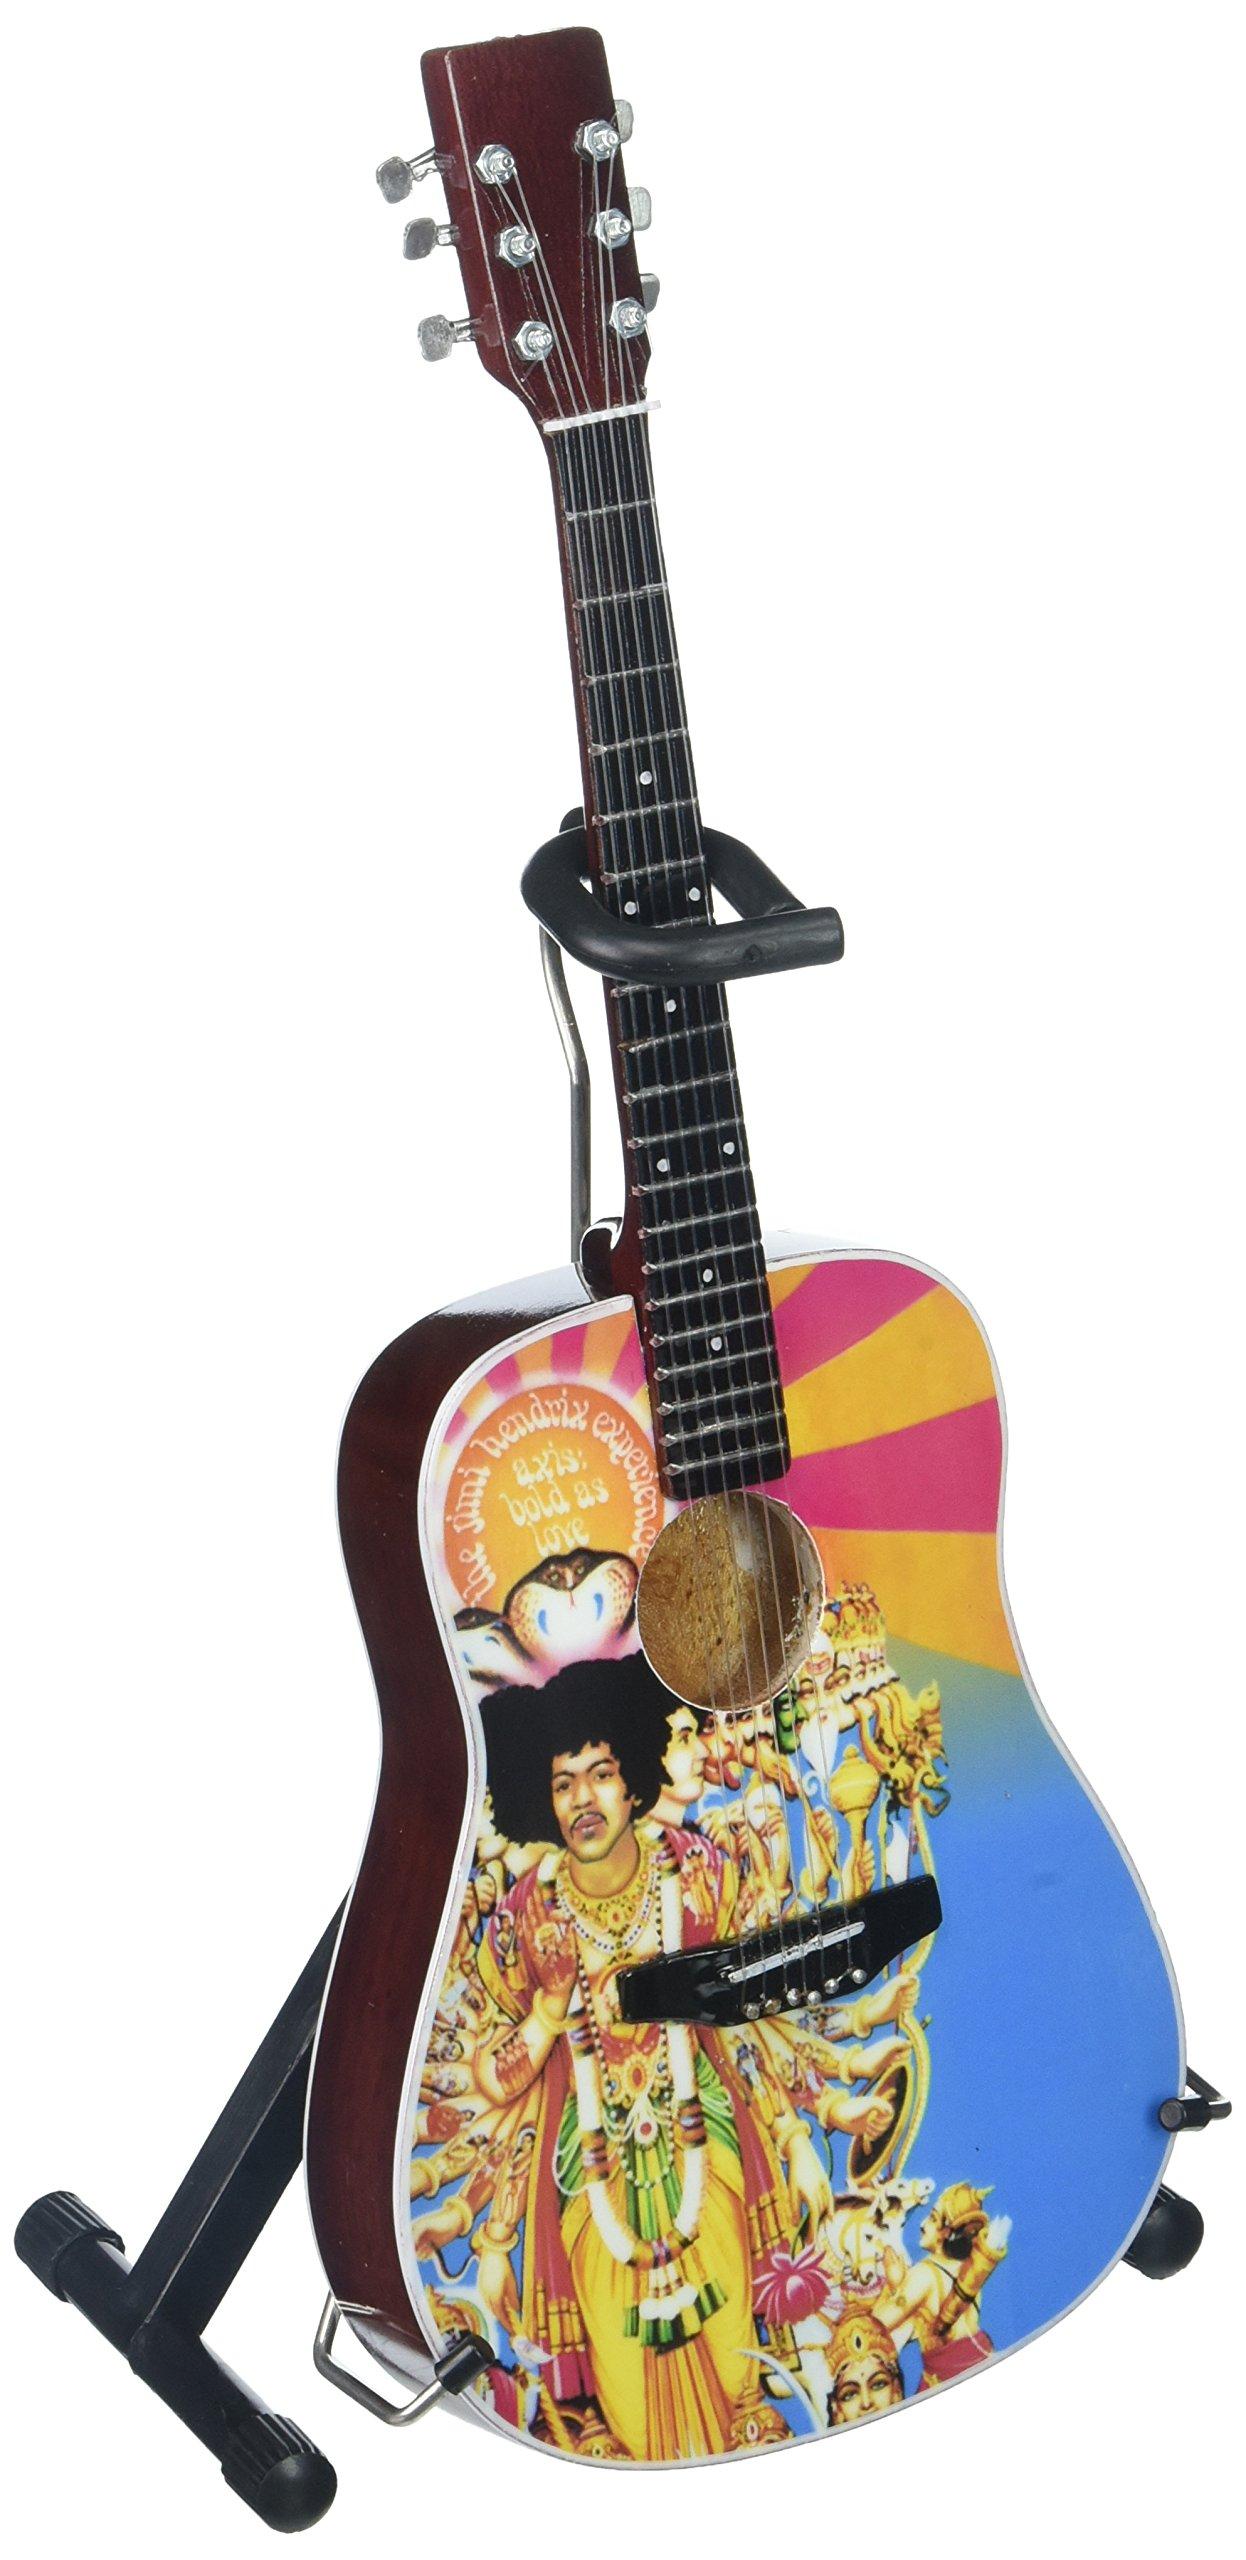 Axe Heaven JH-803 Jimi Hendrix Axis Bold As Love Acoustic Mini Guitar Replica